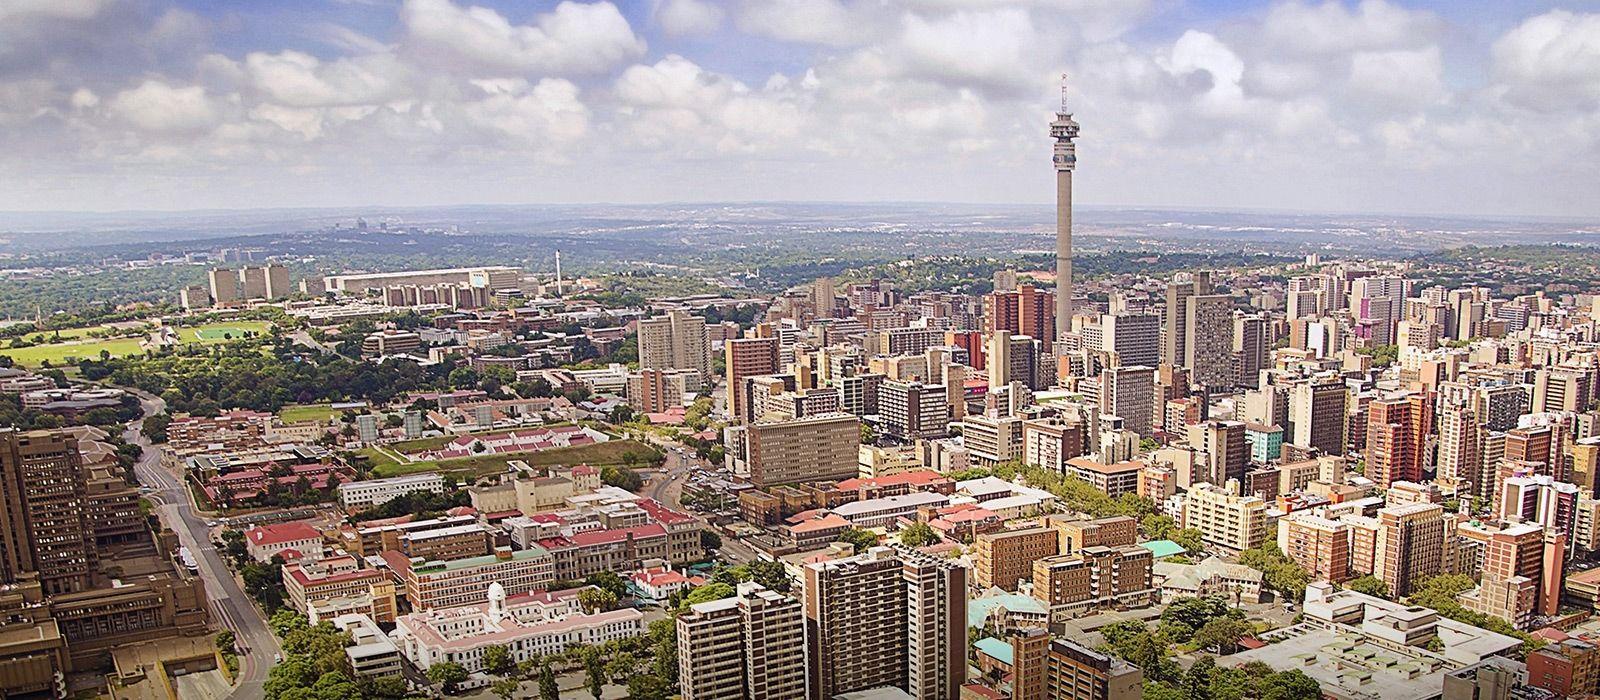 Südafrika & Sambia: Kapstadt, Krüger und Victoriafälle Urlaub 3